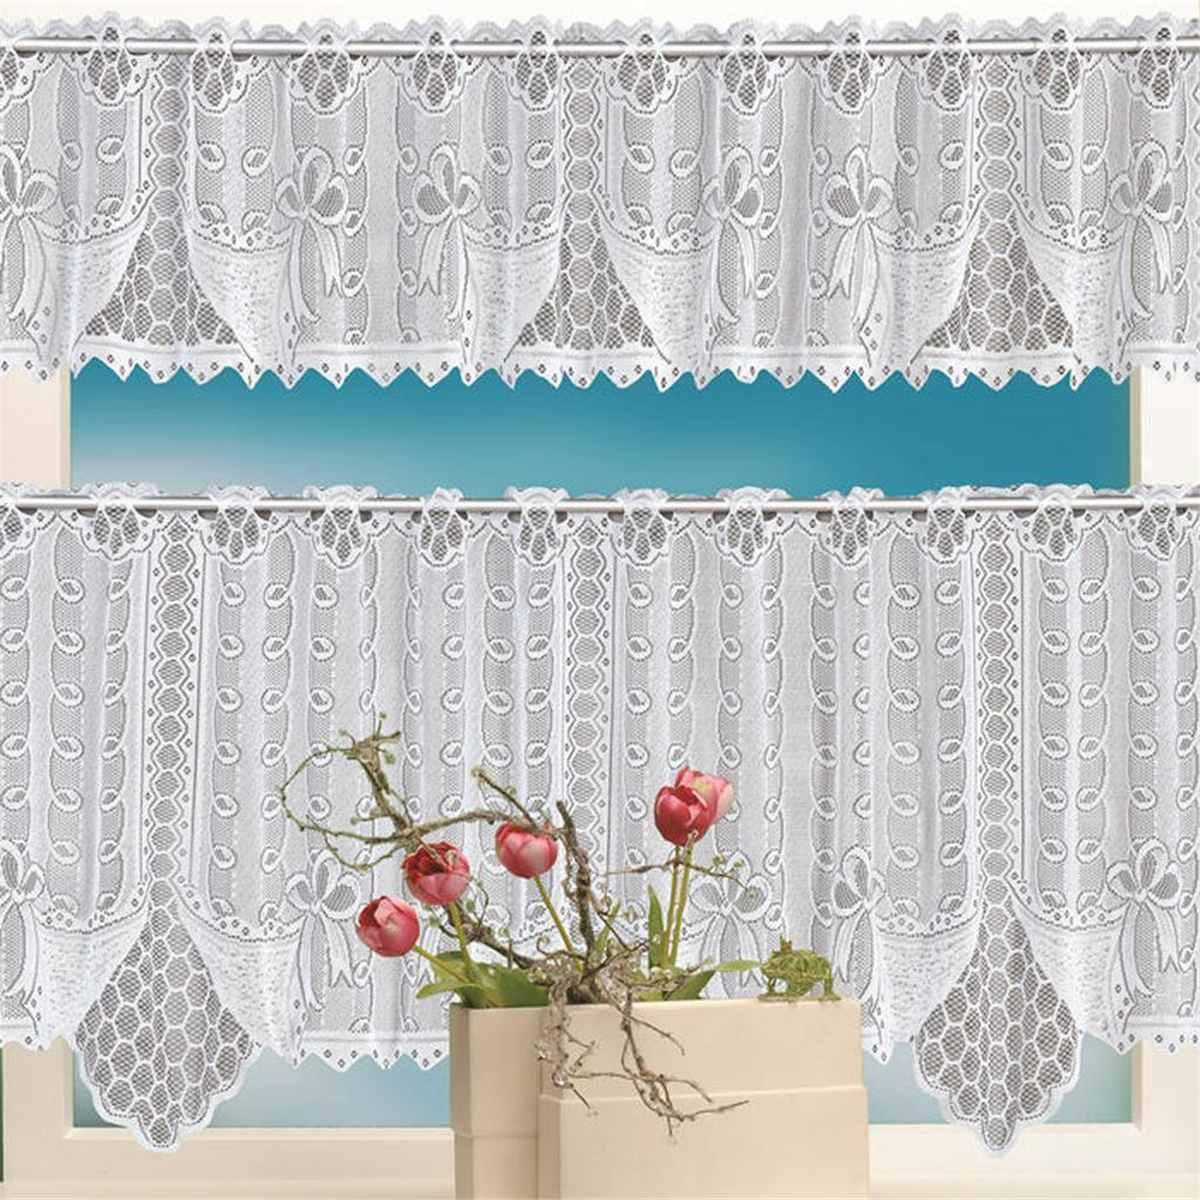 New 2pcs Elegant Lace Coffee Cafe Window Tier Curtain Kitchen